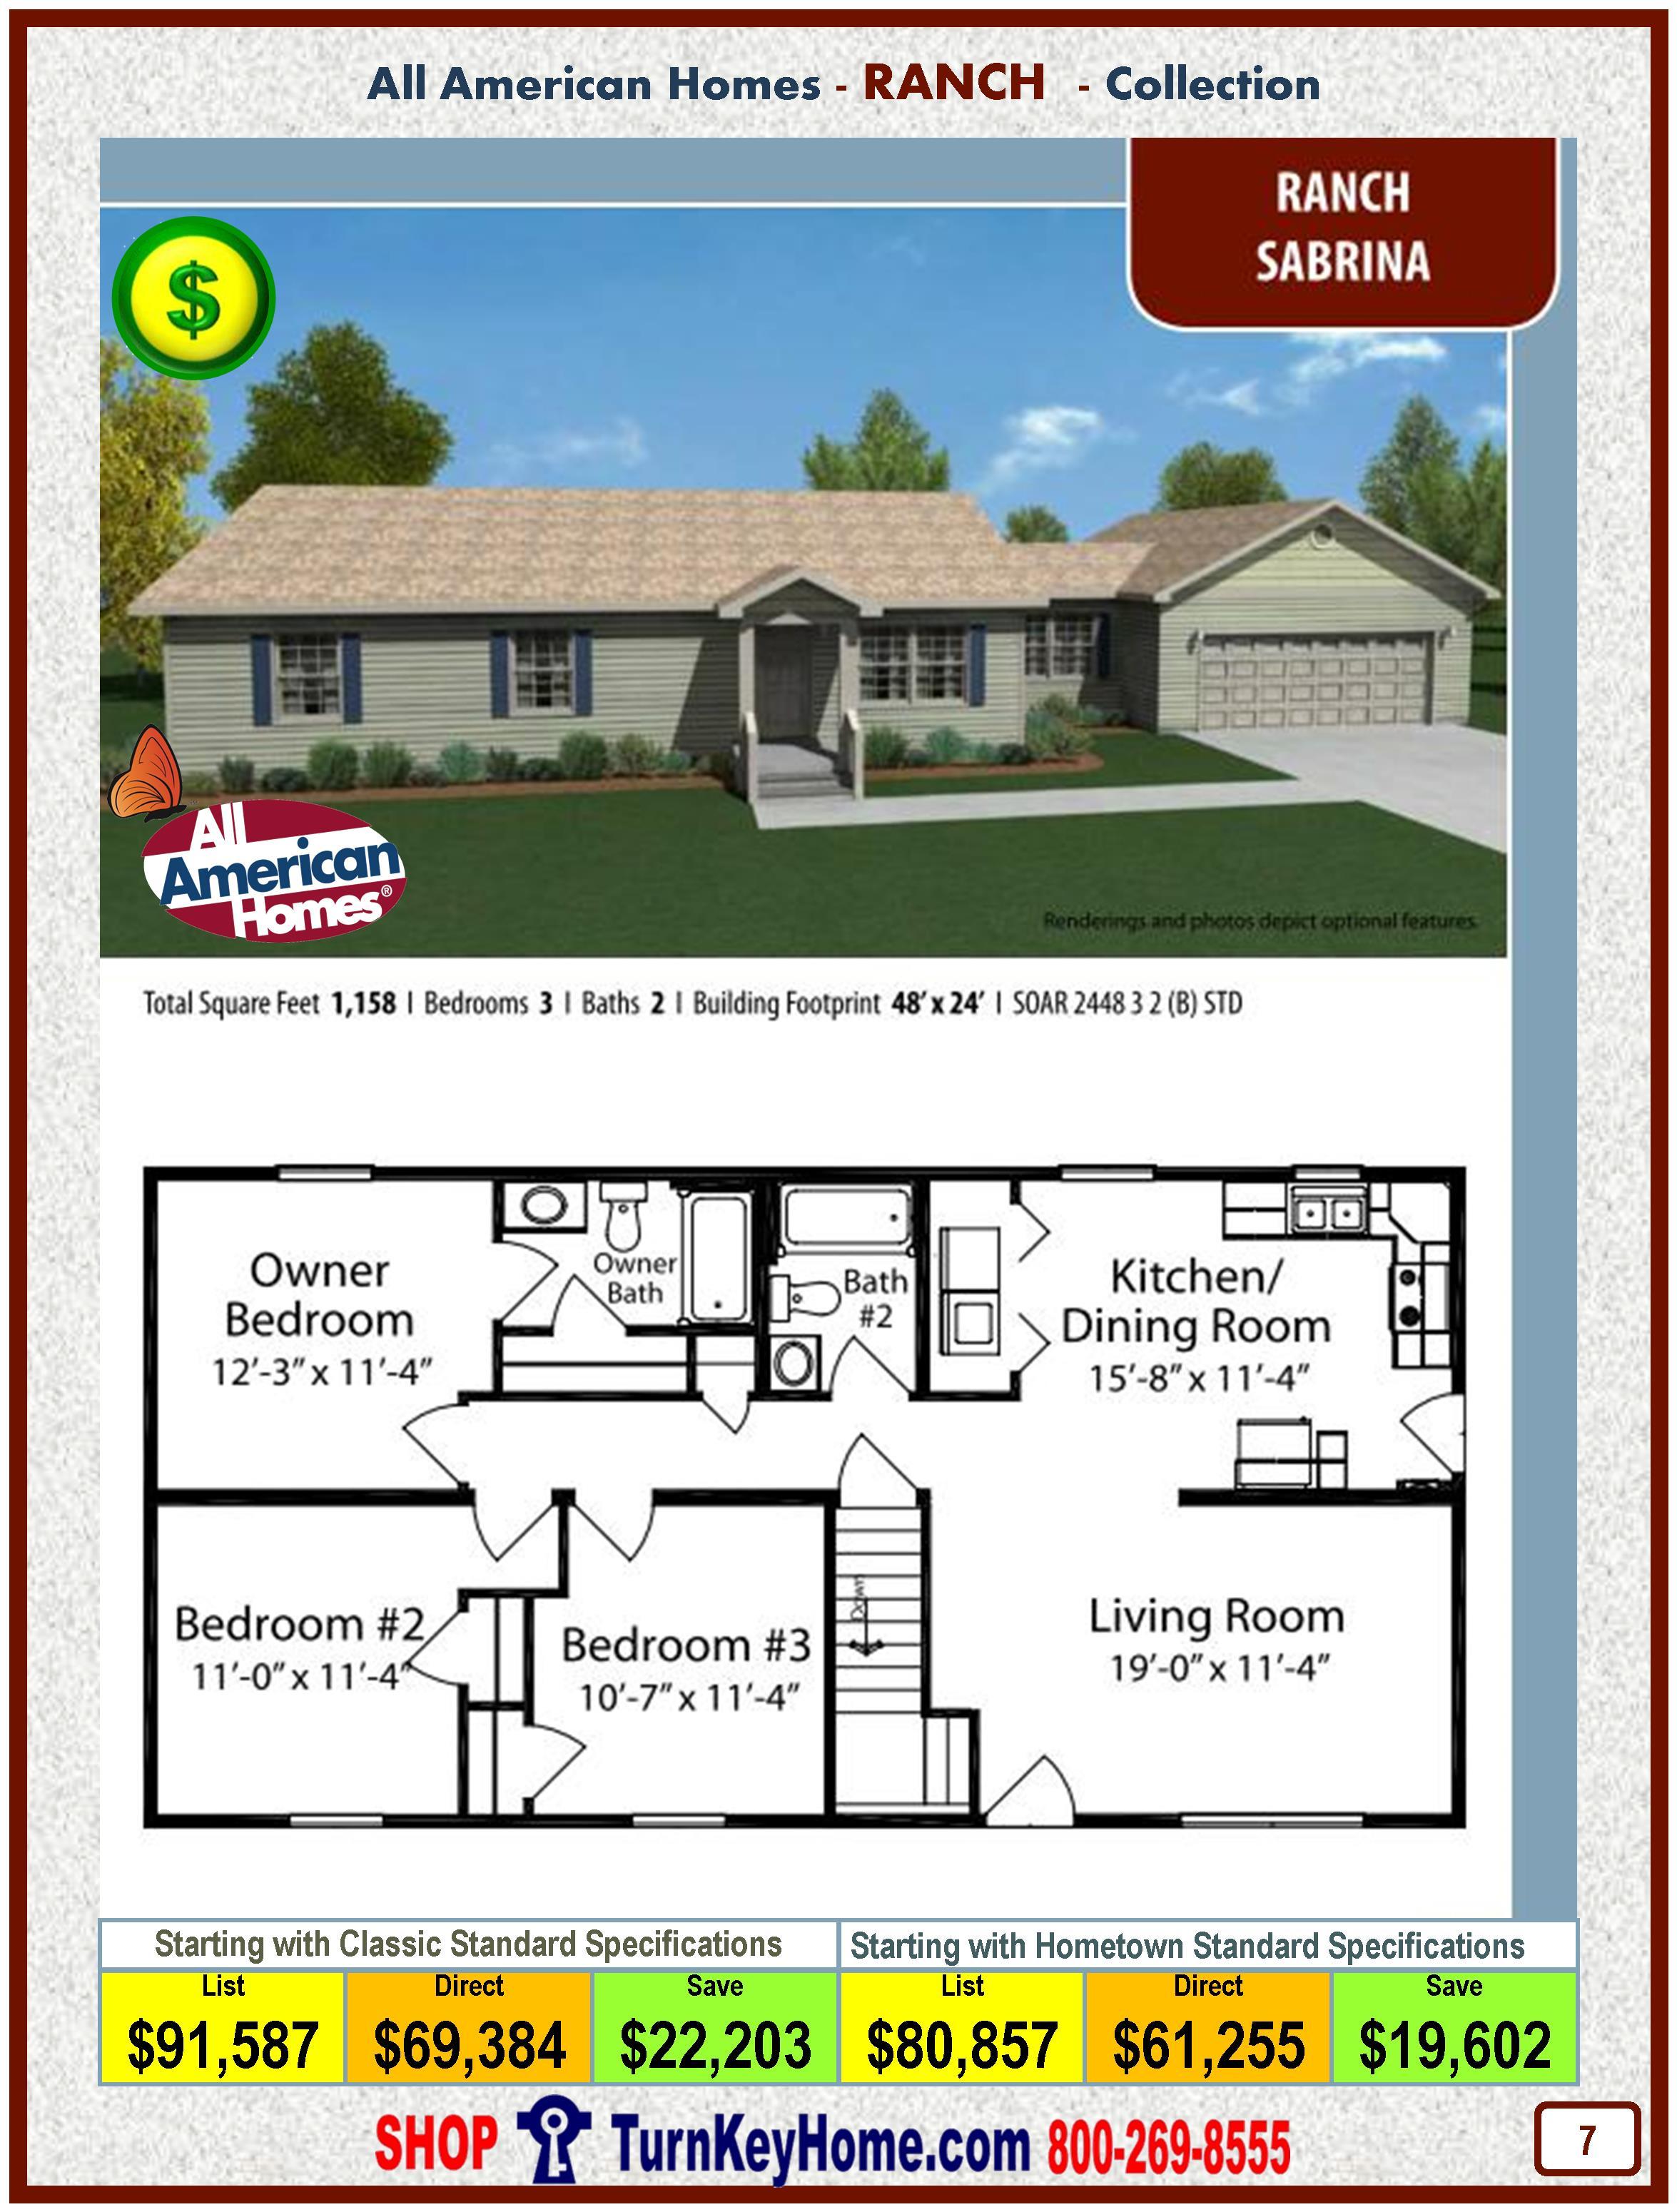 sabrina all american modular home ranch collection plan price